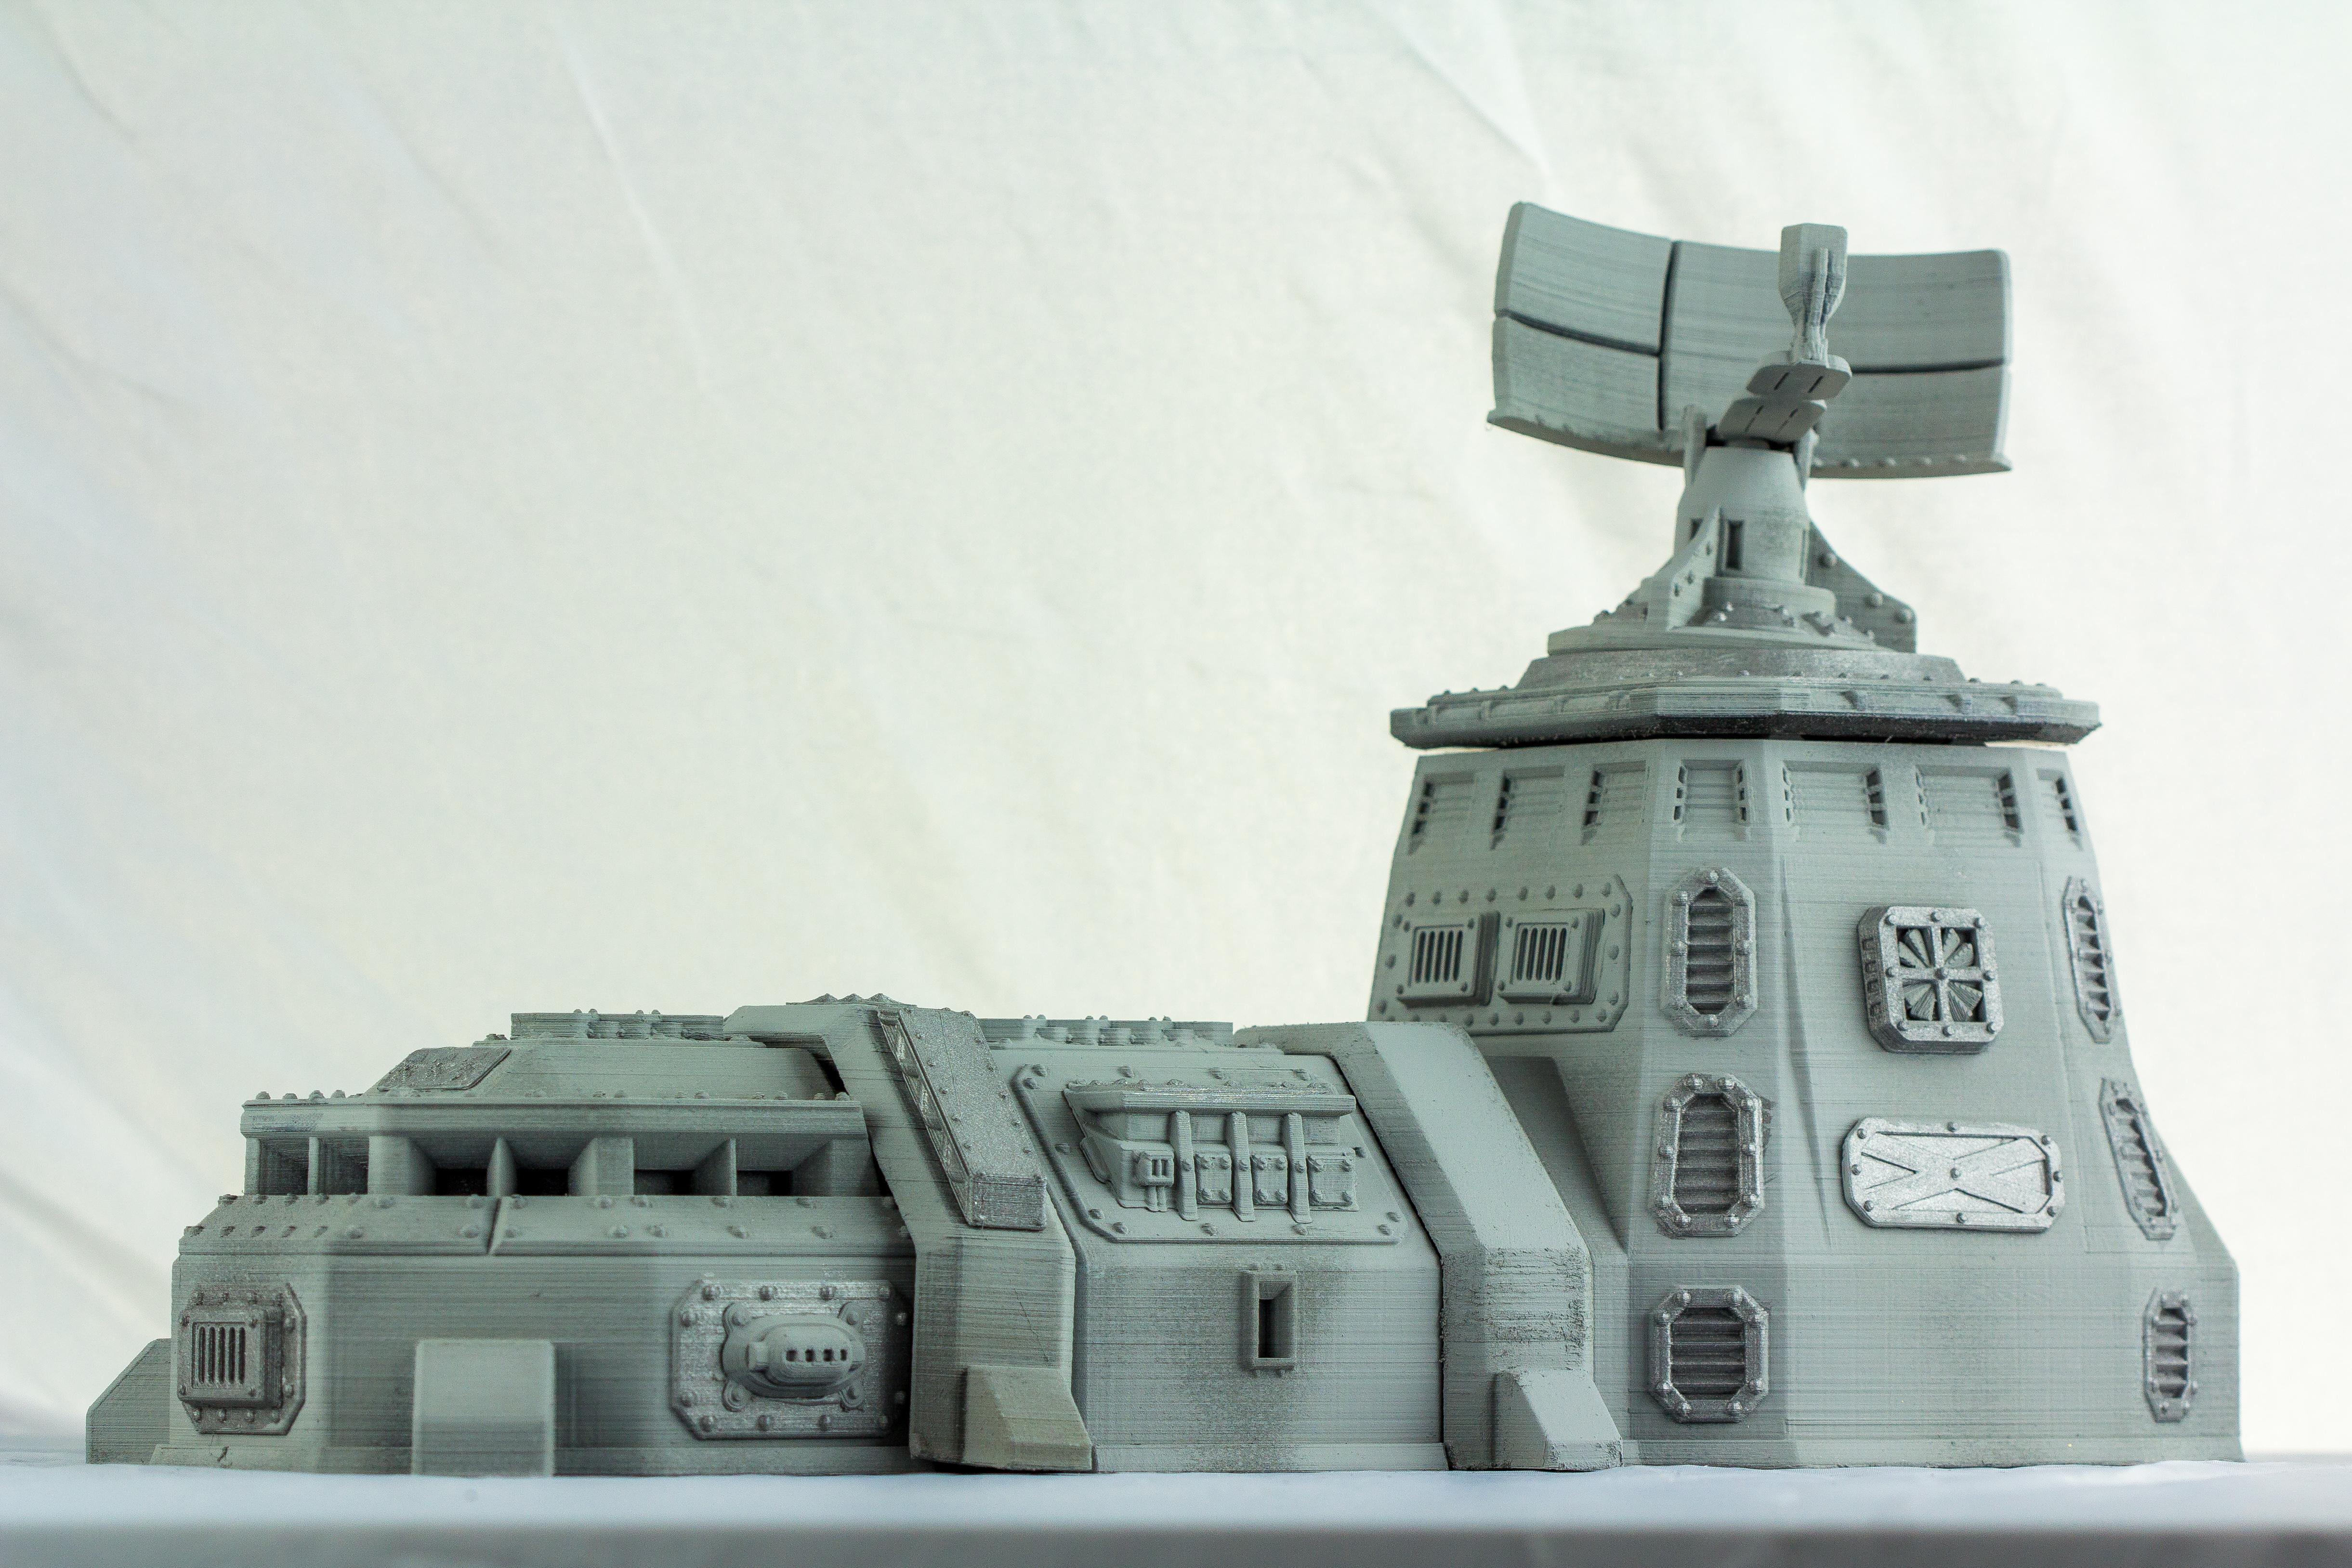 Printable 3D Terrain For War Games » Maker Fun 3D - 3D Printing And - Free 3D Printable Terrain